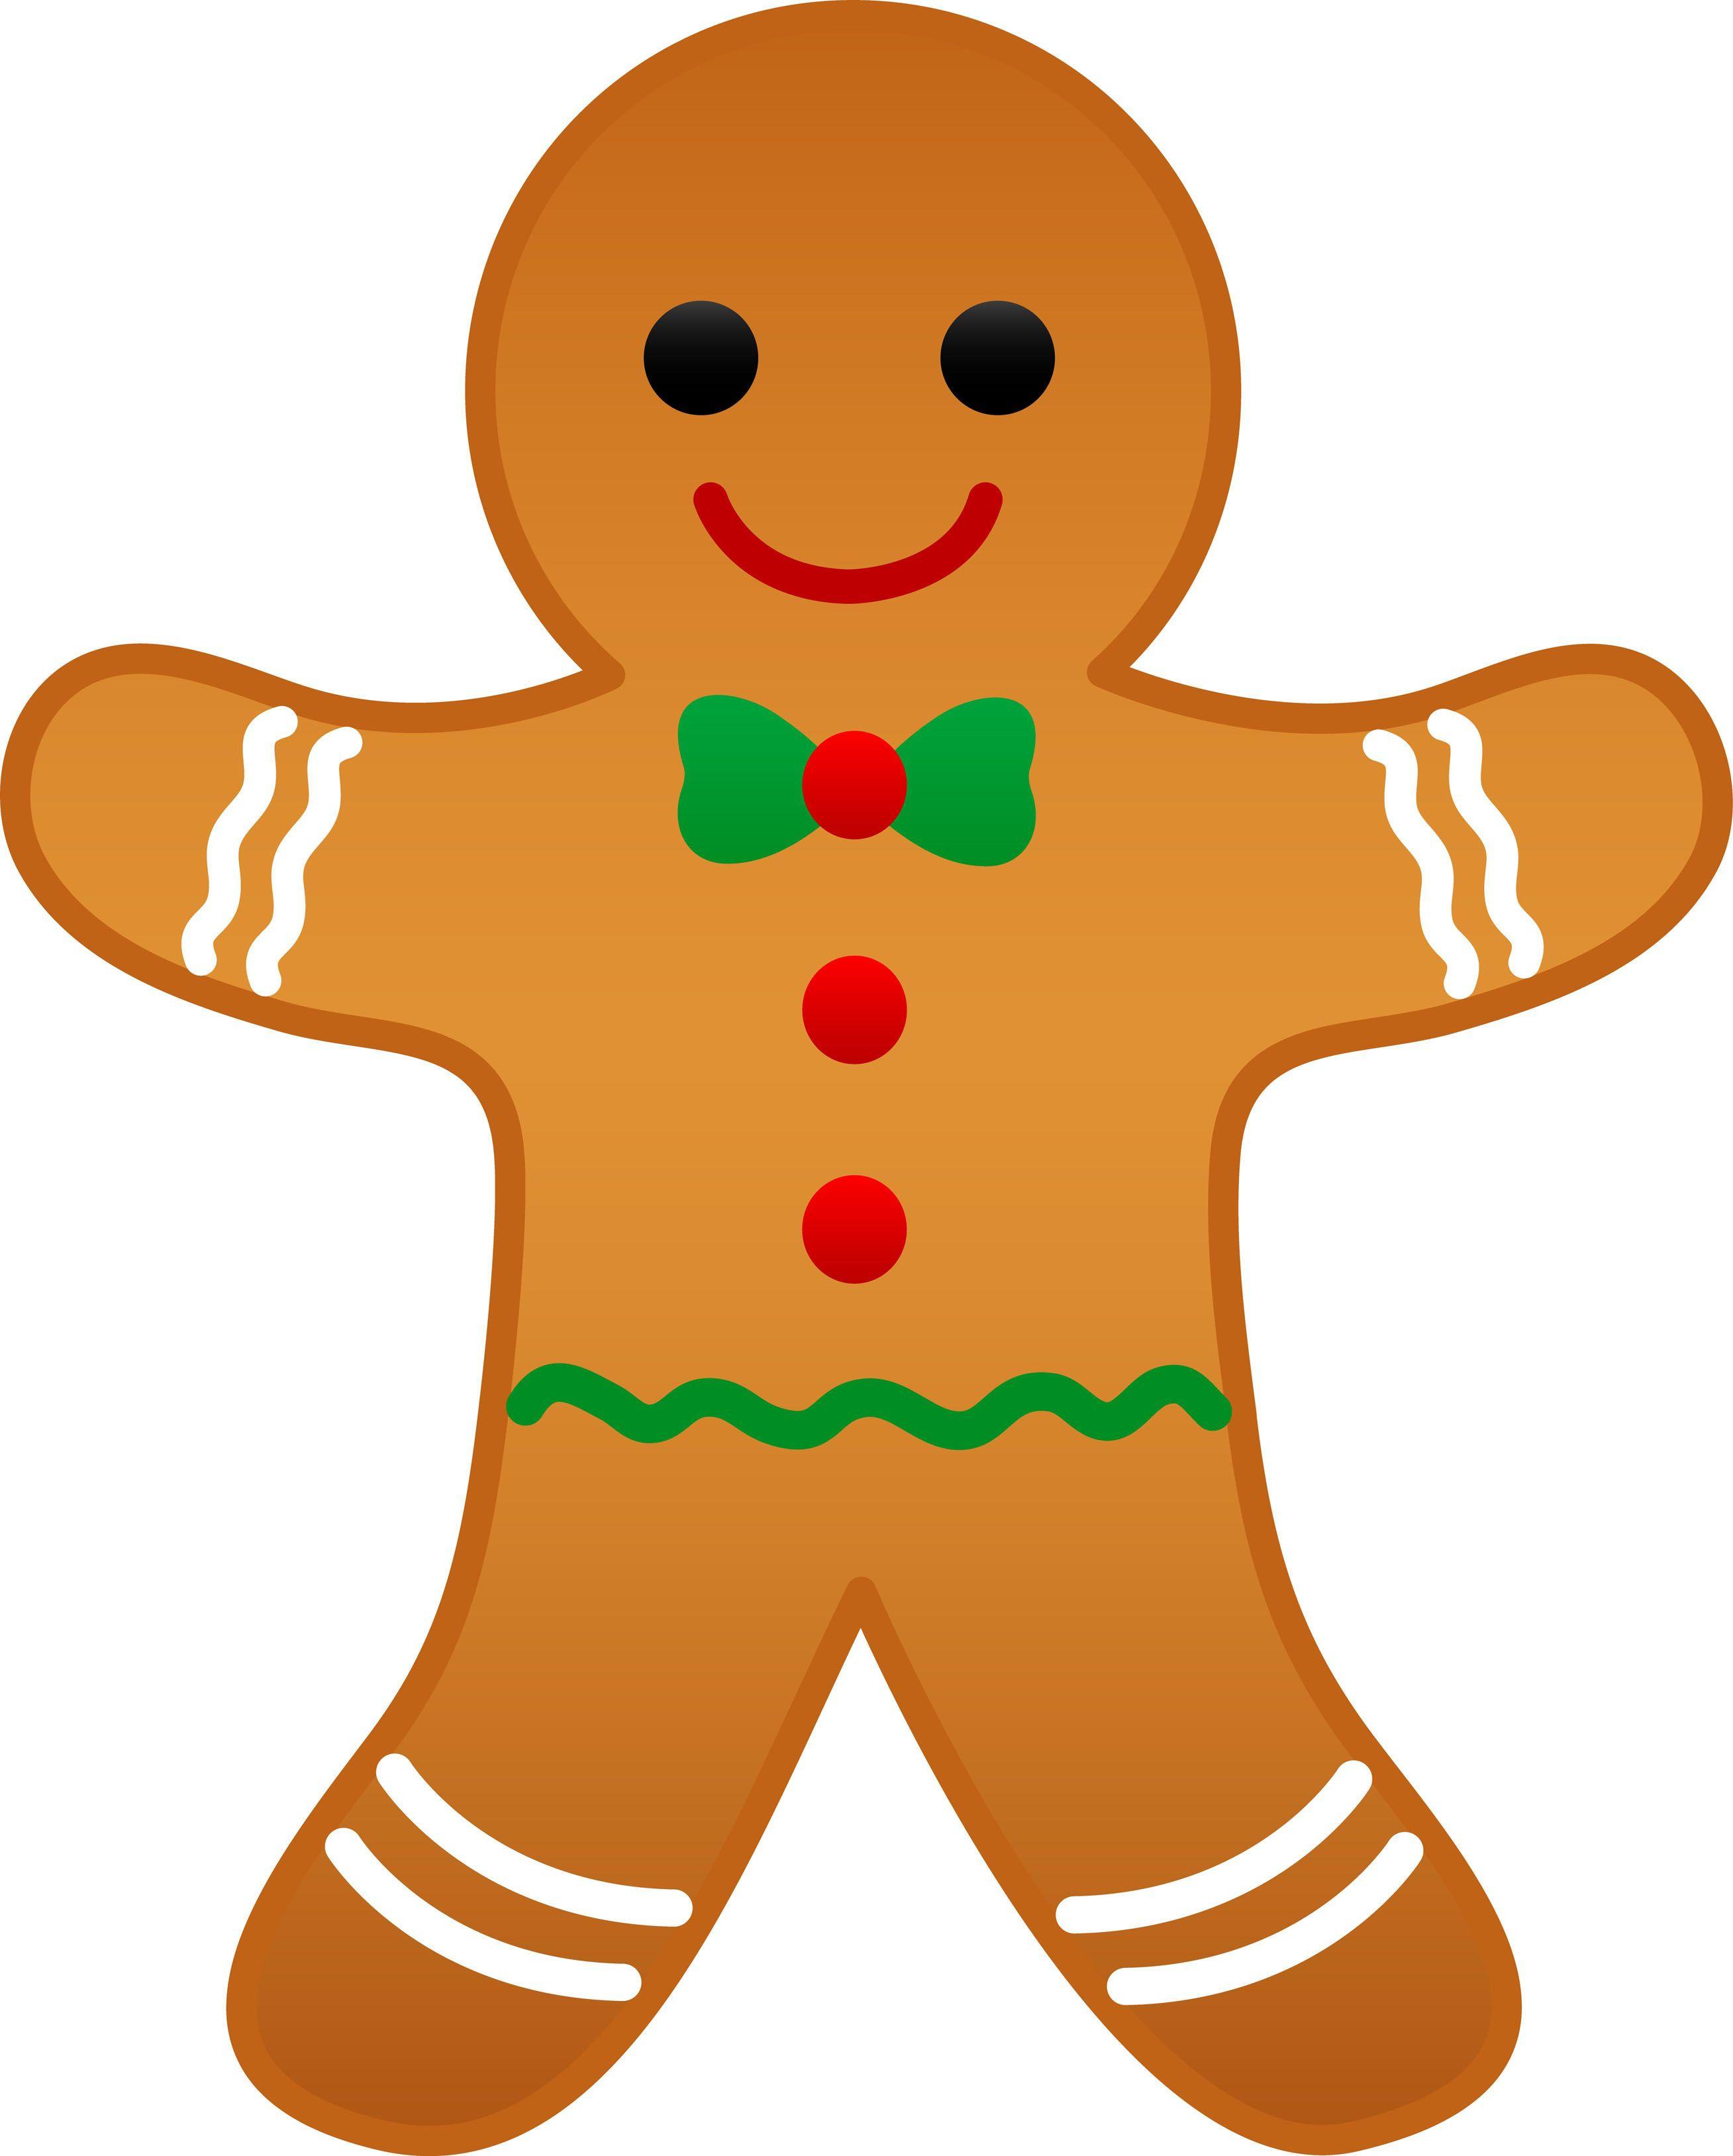 2617x3255 Gingerbread Man.jpg Christmas Decorations